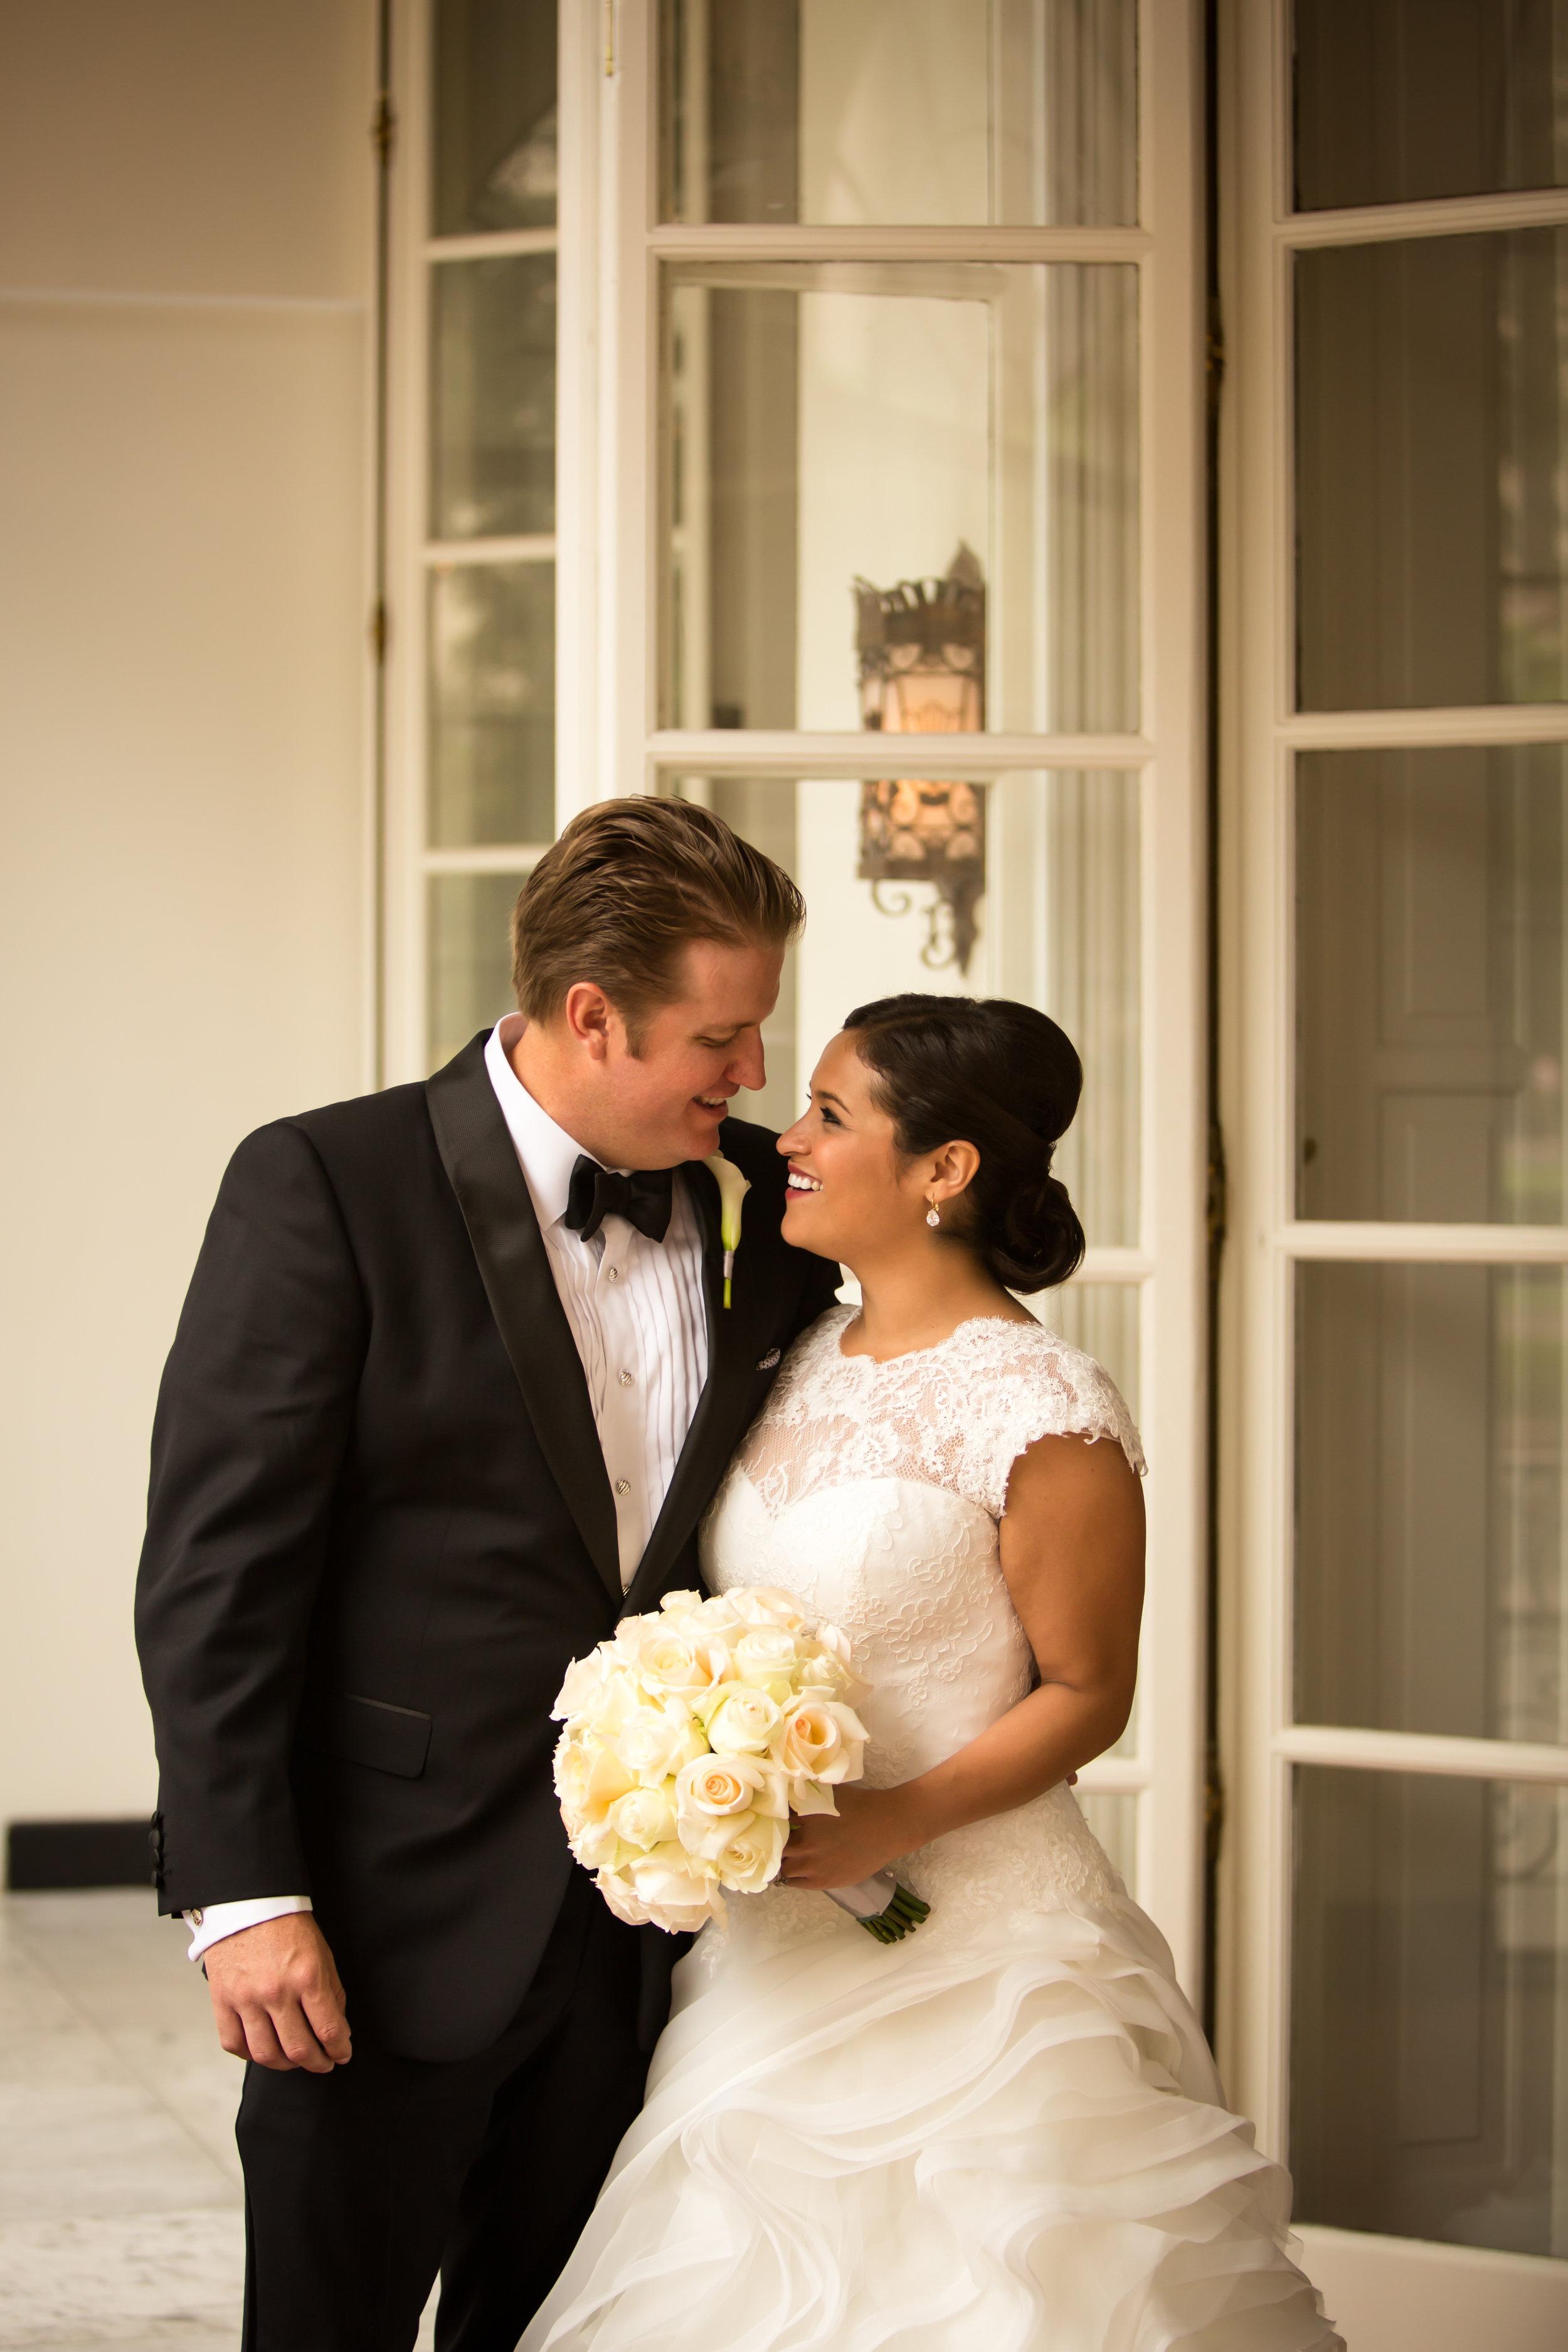 Marble_Falls_Horseshoe_Bay_Photographer_Torres_Wedding_24.jpg